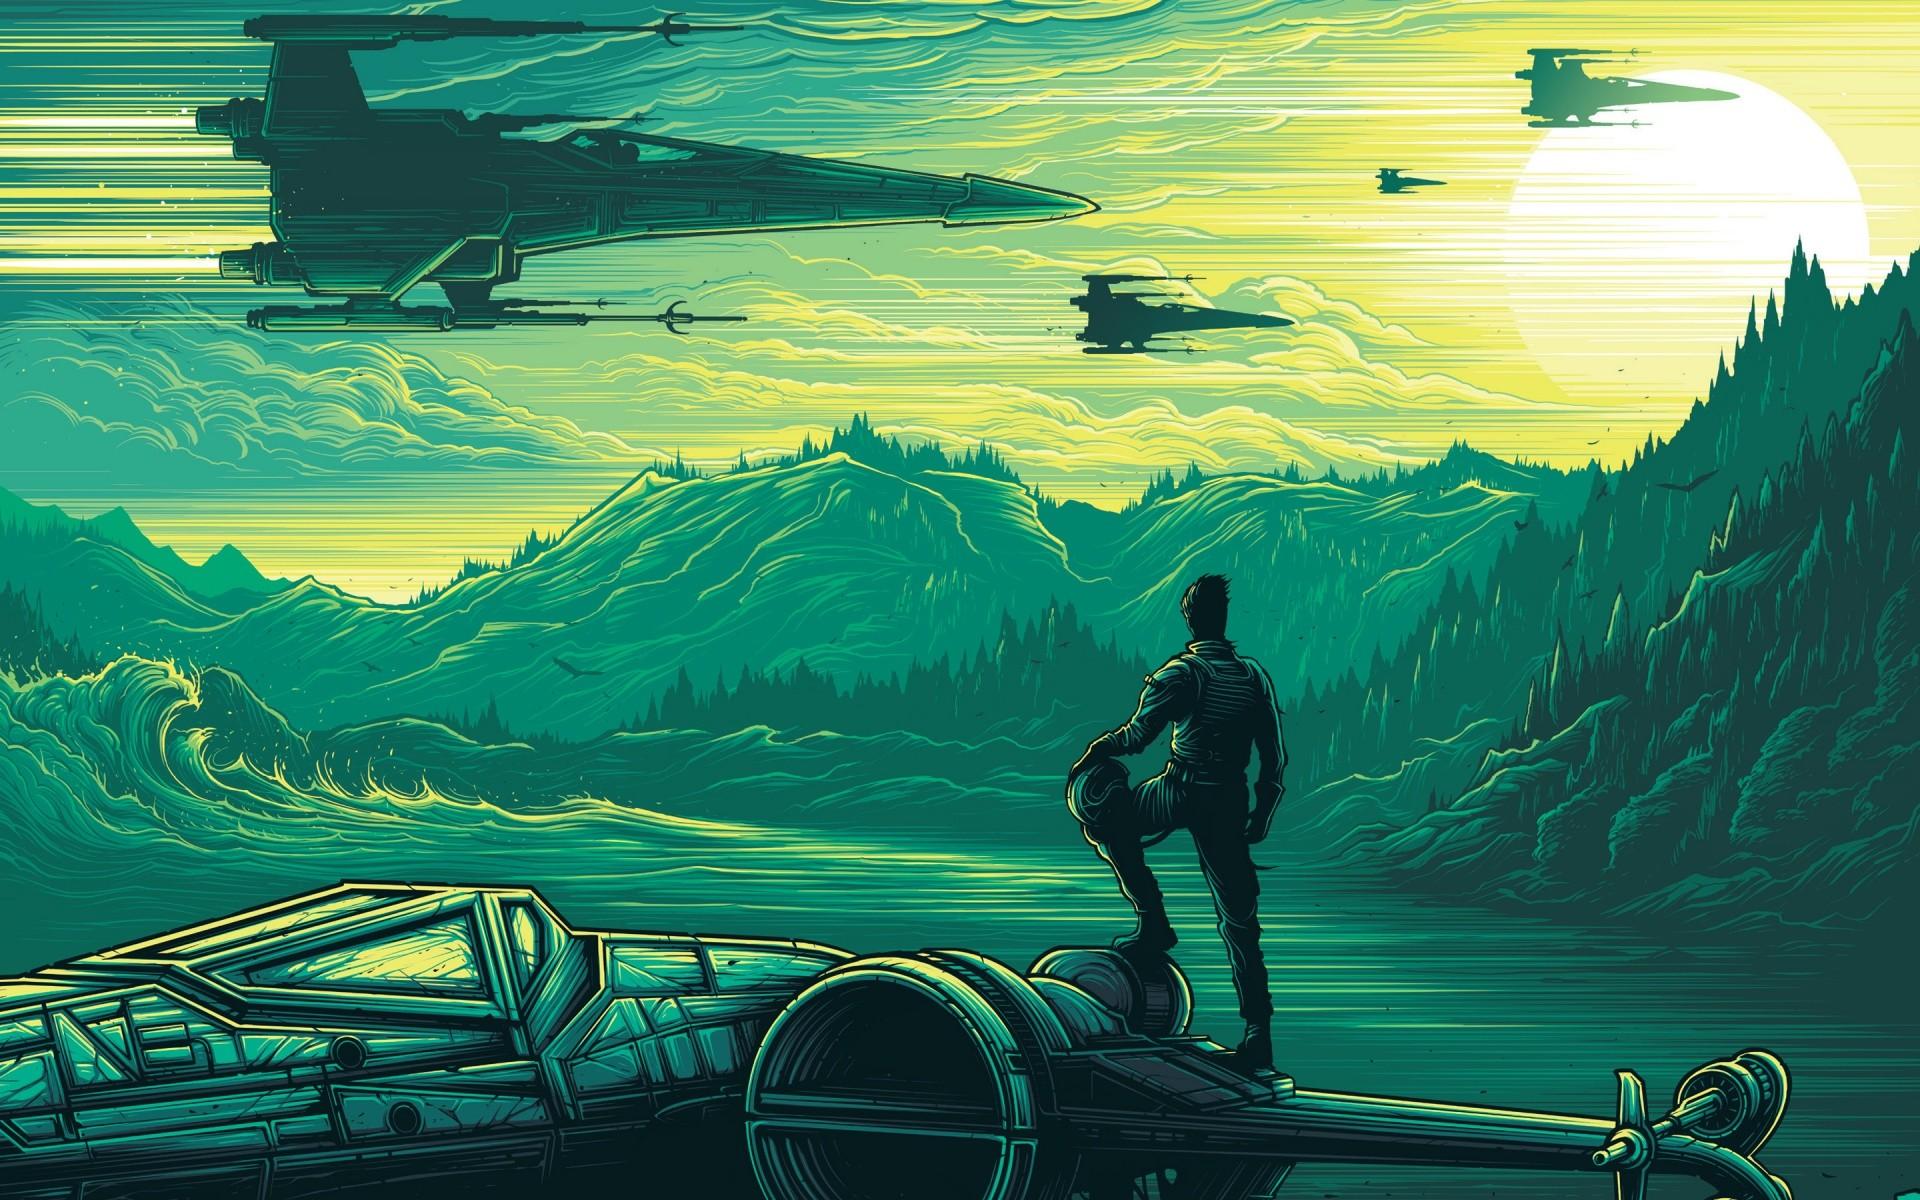 Wallpaper HD Star Wars The Force Awakens IMAX – HD Wallpaper Expert